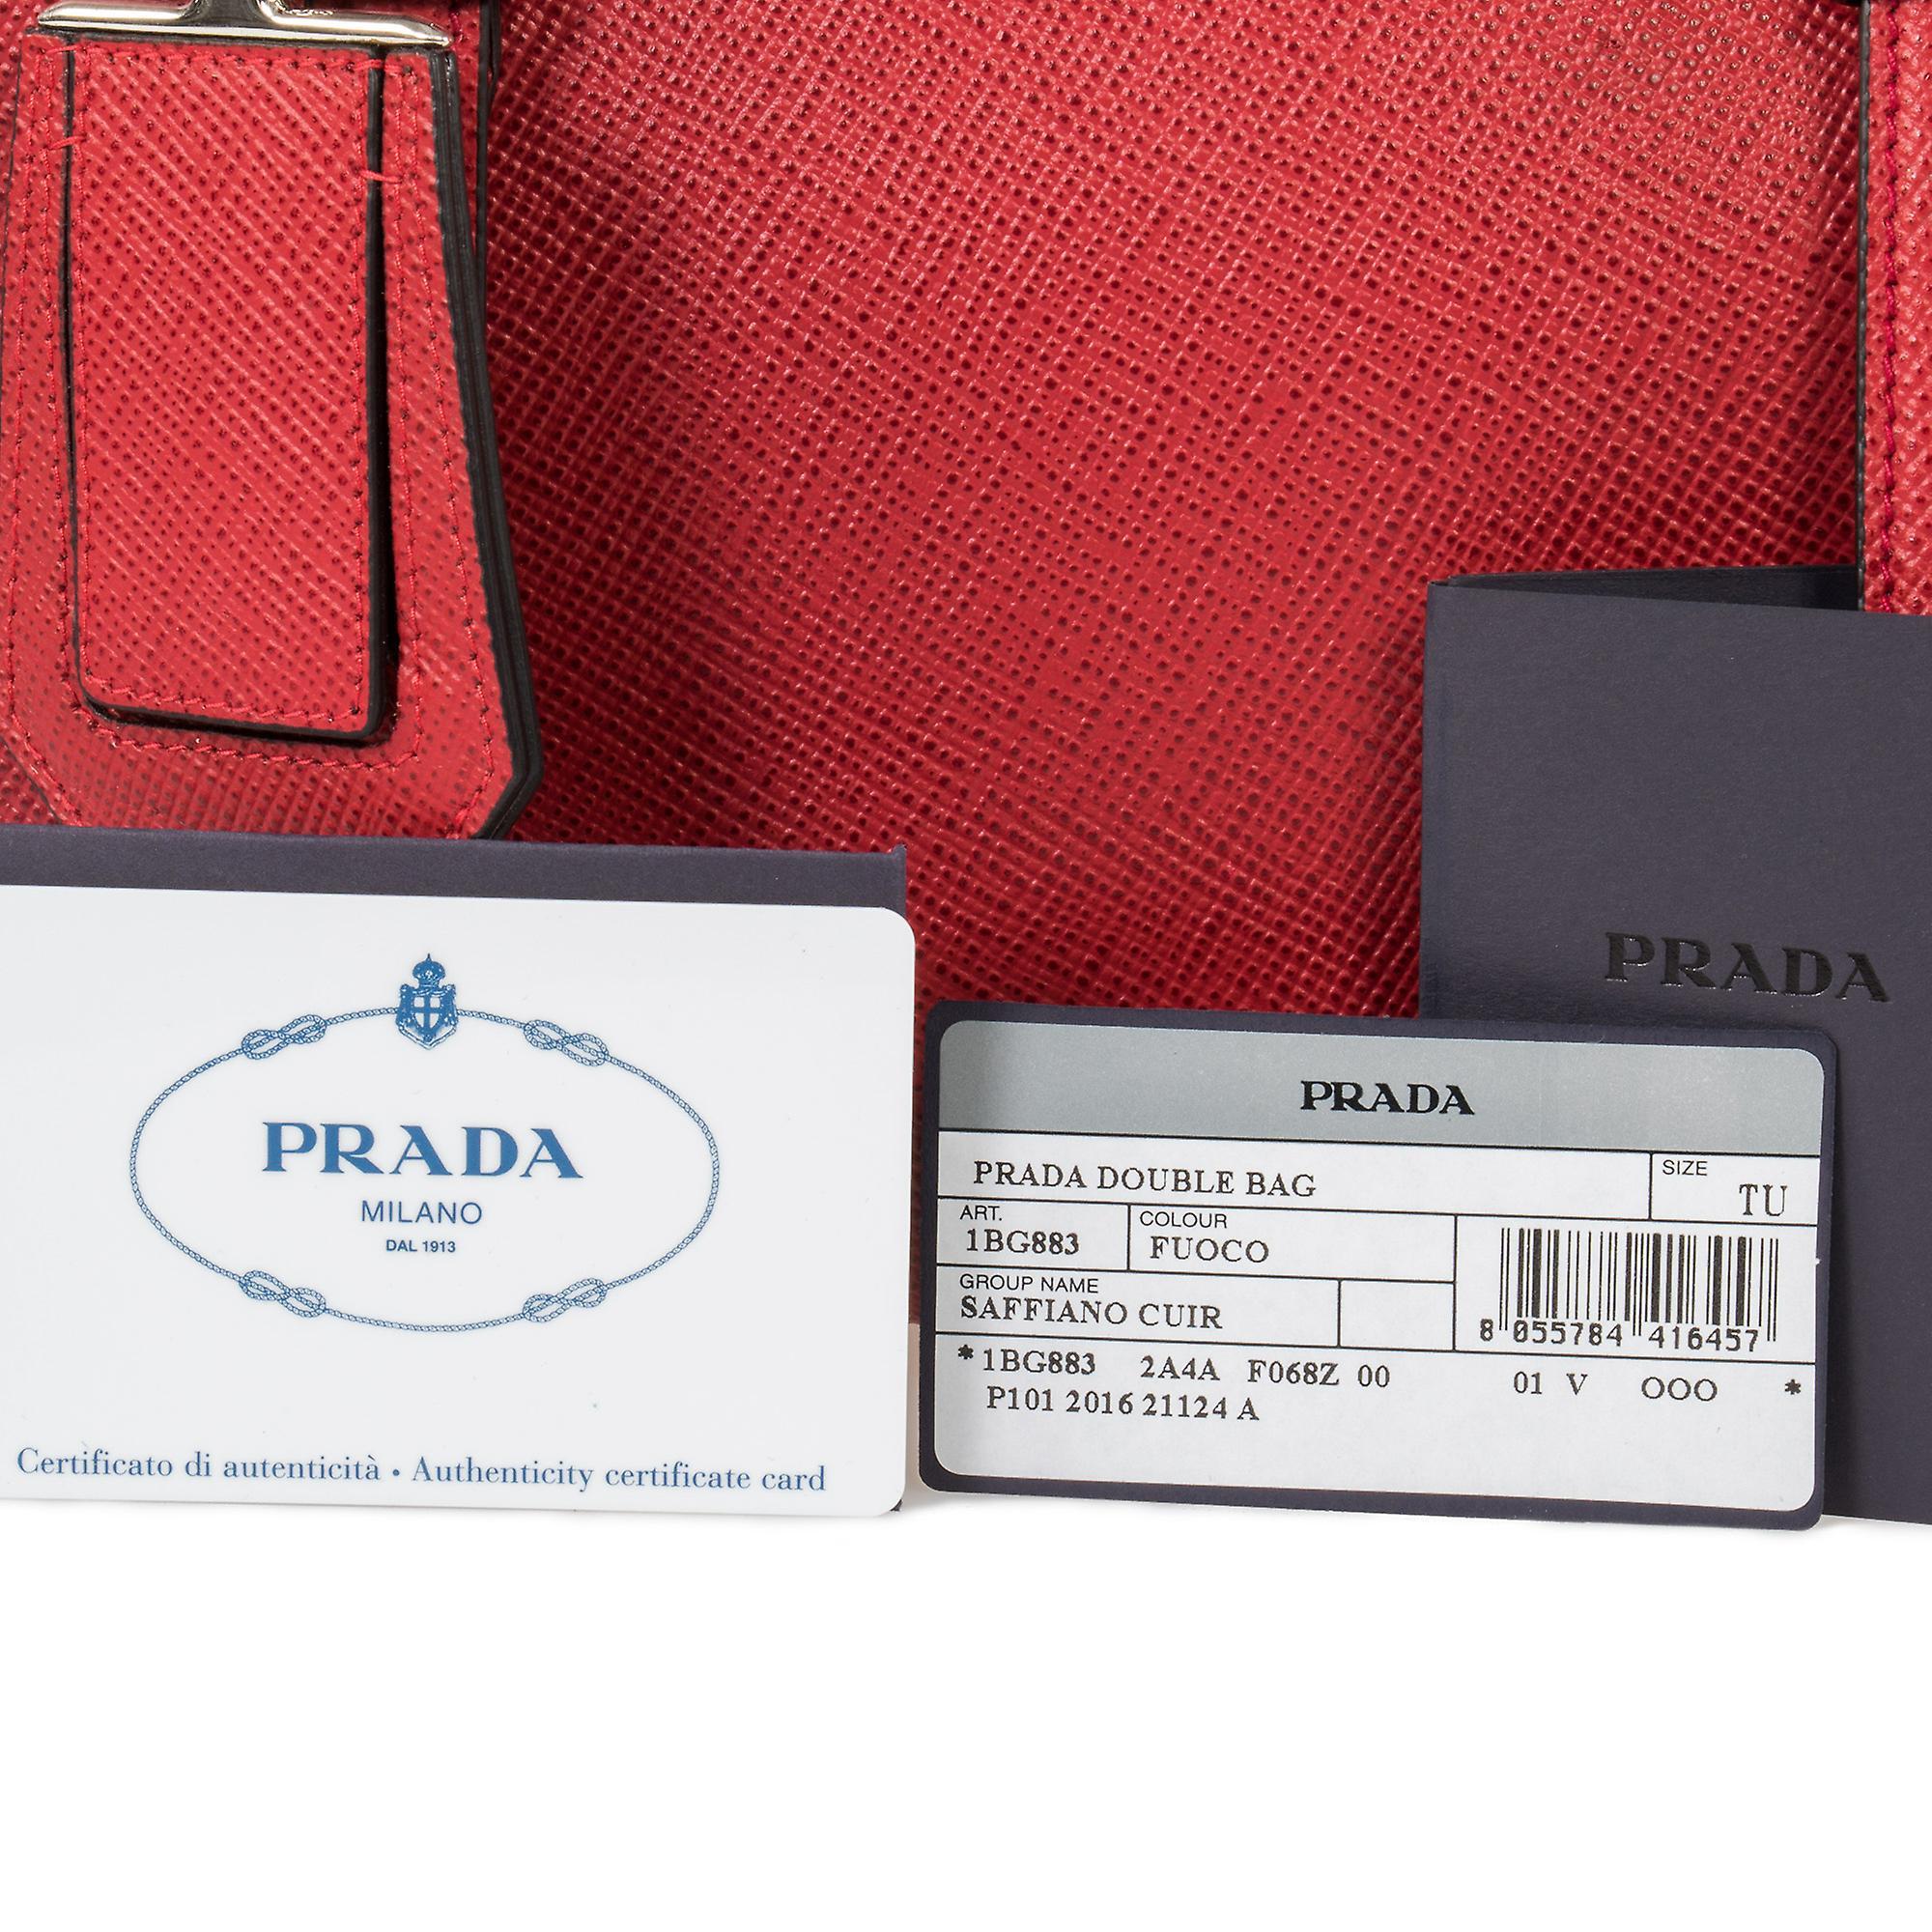 Prada Double Tote Leather Bag 1BG883 F068Z | Red/Fuoco | Small